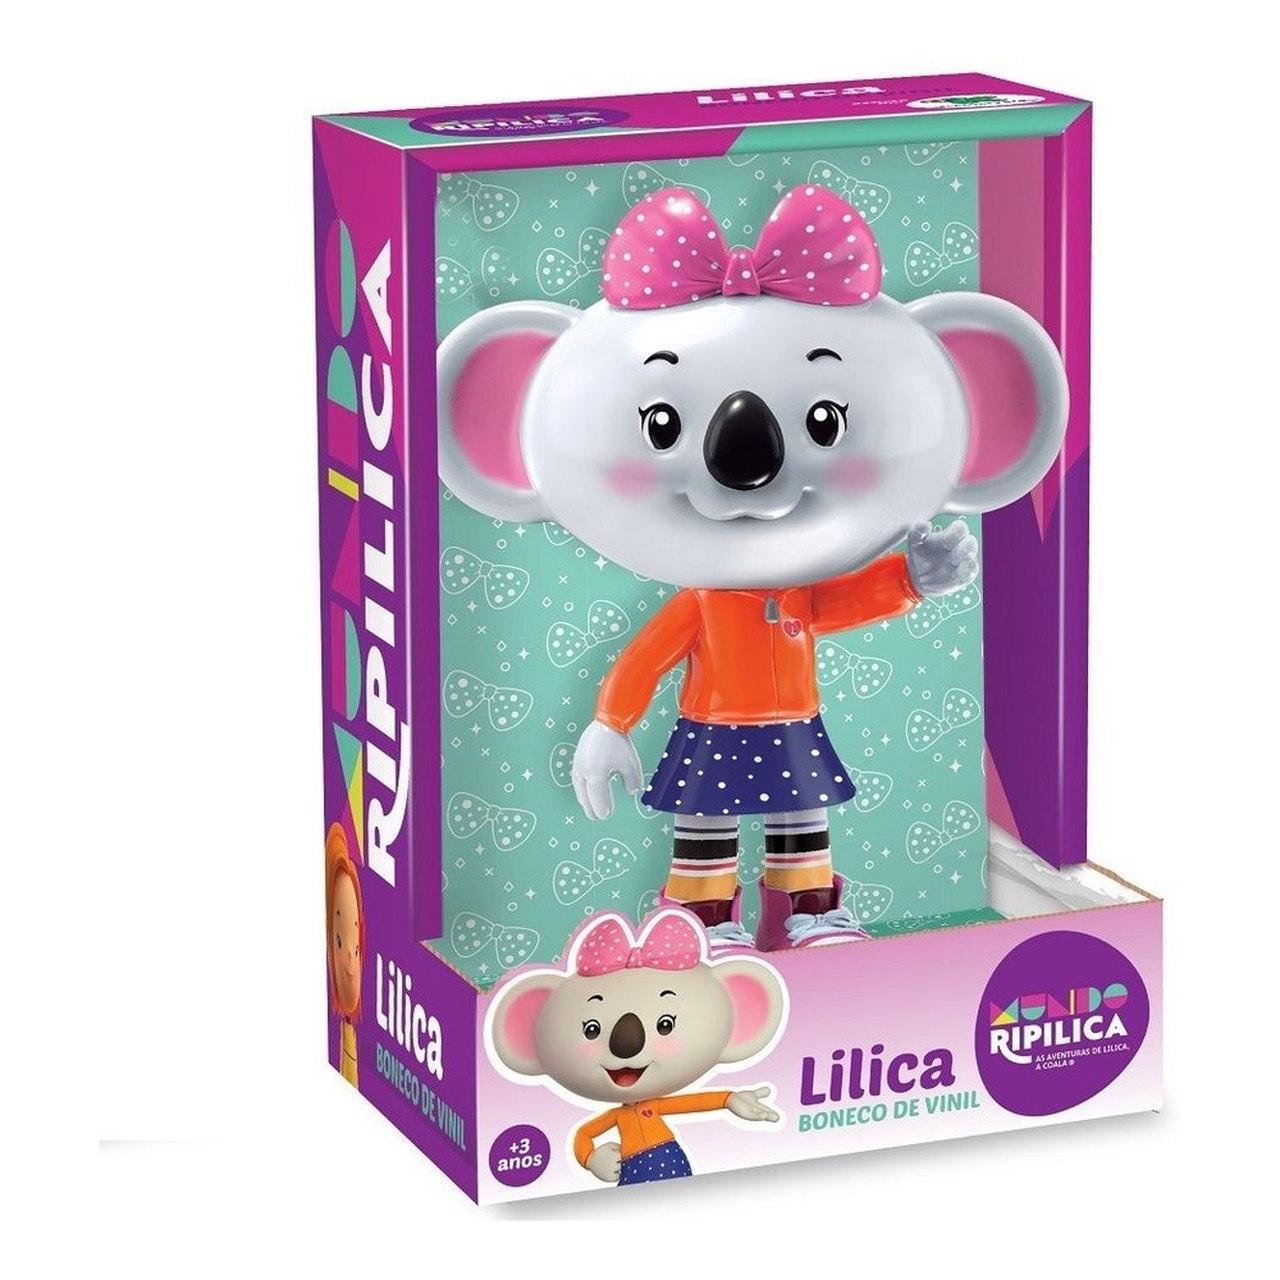 Boneca Vinil Lilica Mundo Ripilica Lider Brinquedos